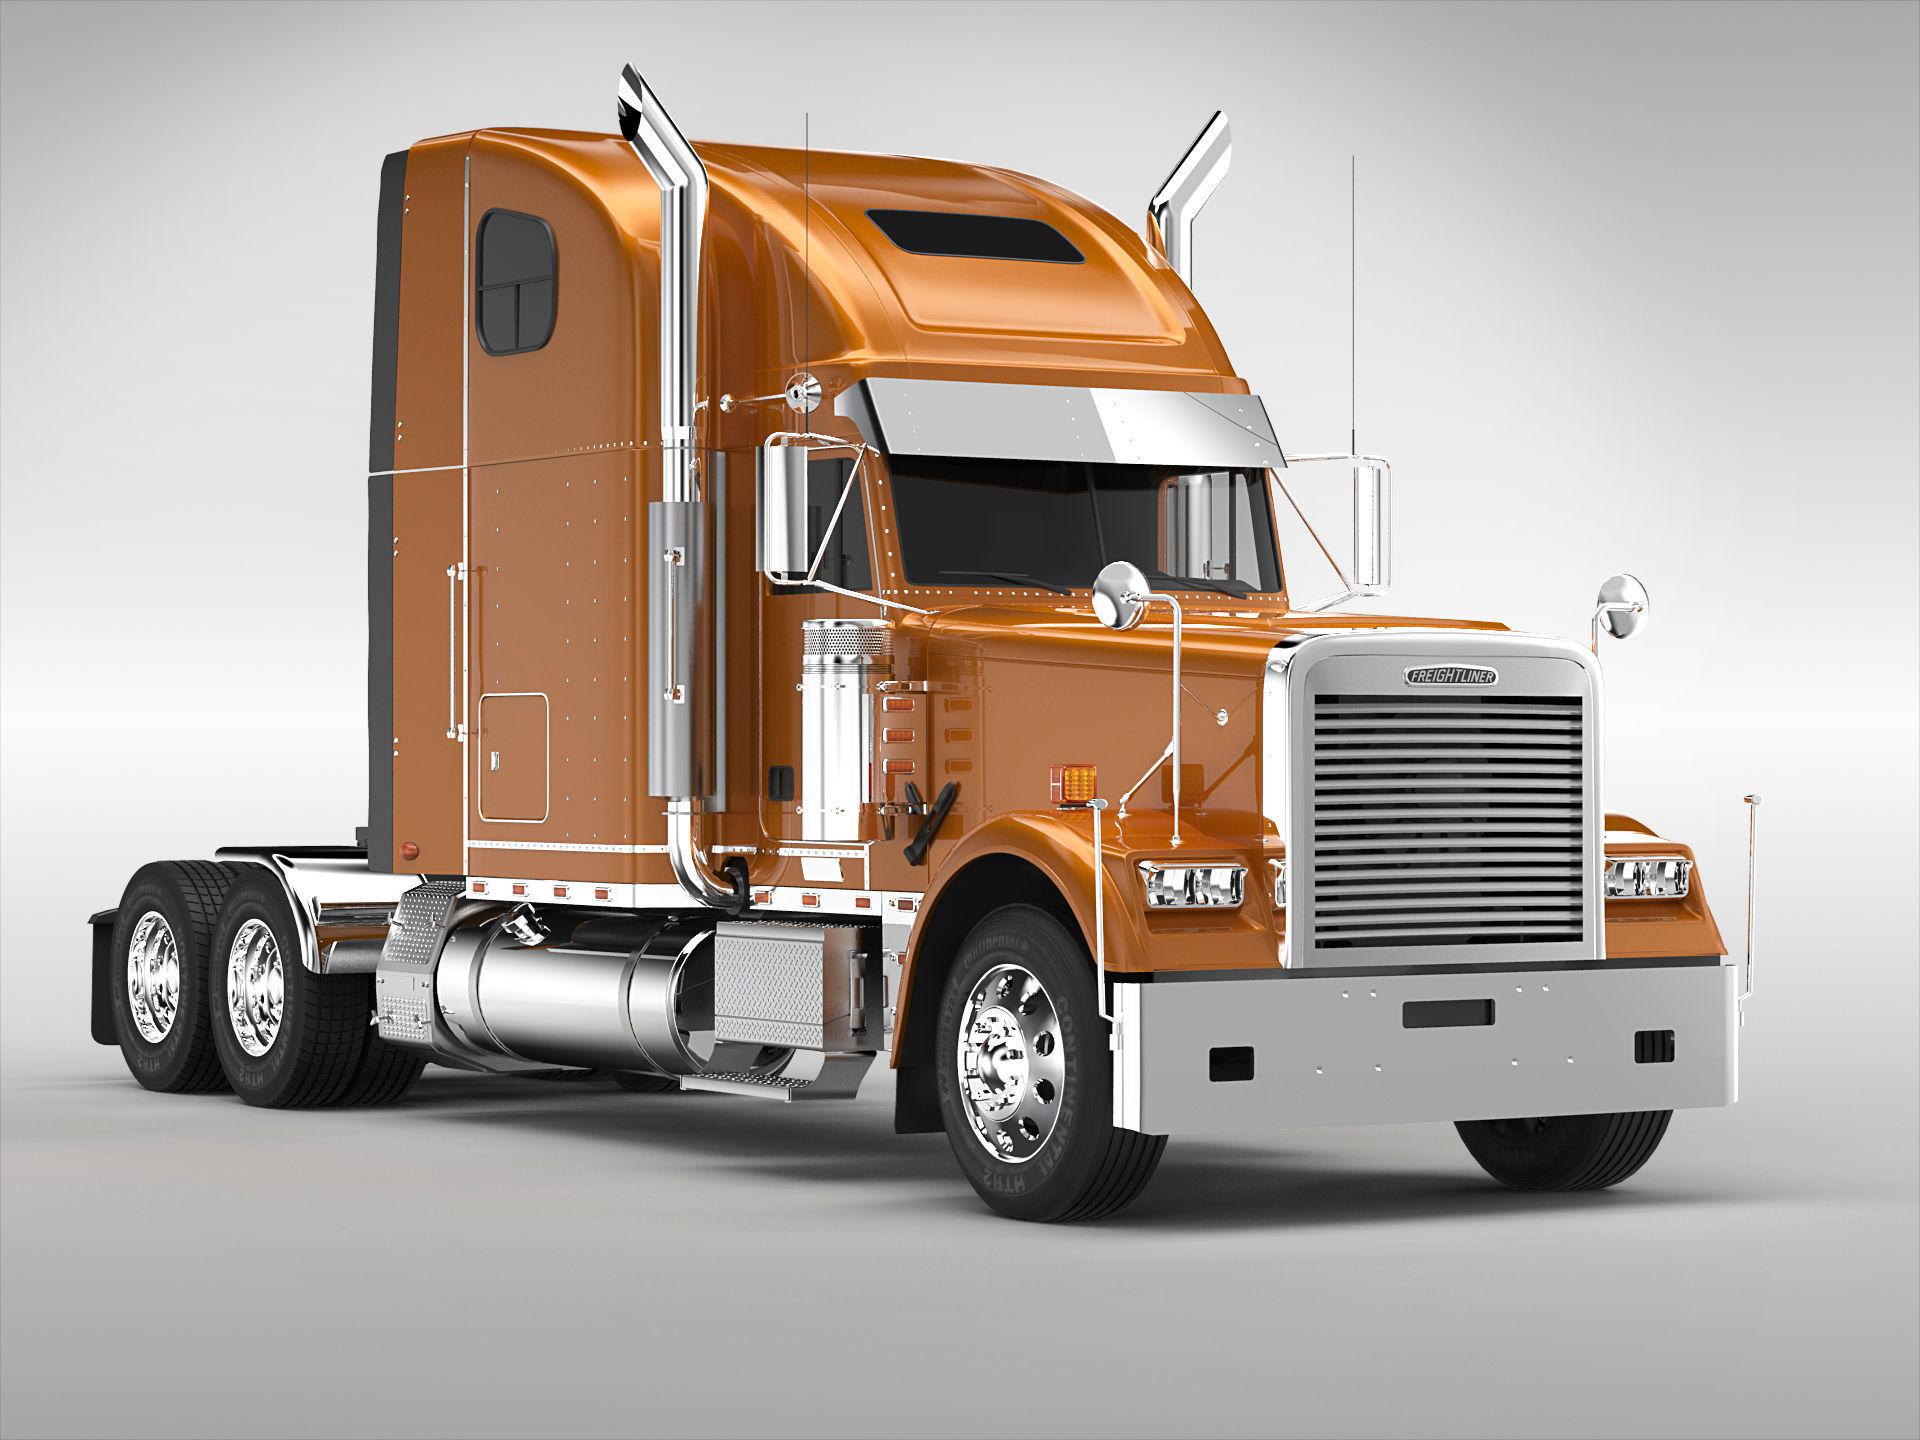 Freightliner Classic XL (Bobtail)